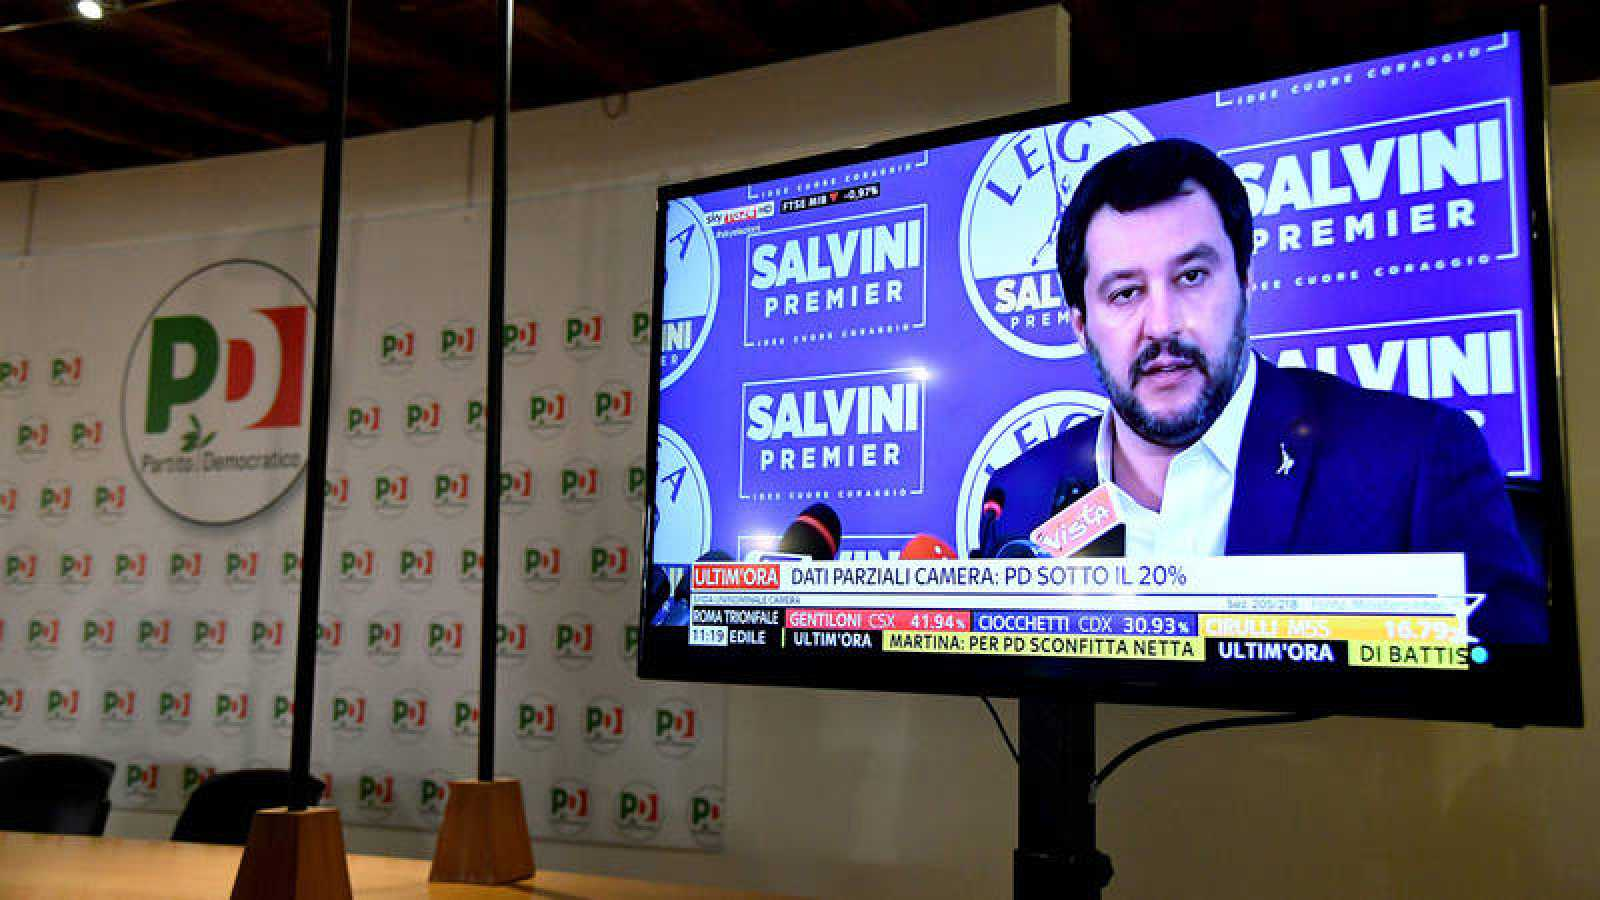 Una pantalla de la sede del Partido Demócrata muestra al líder de la Liga Norte, Matteo Salvini